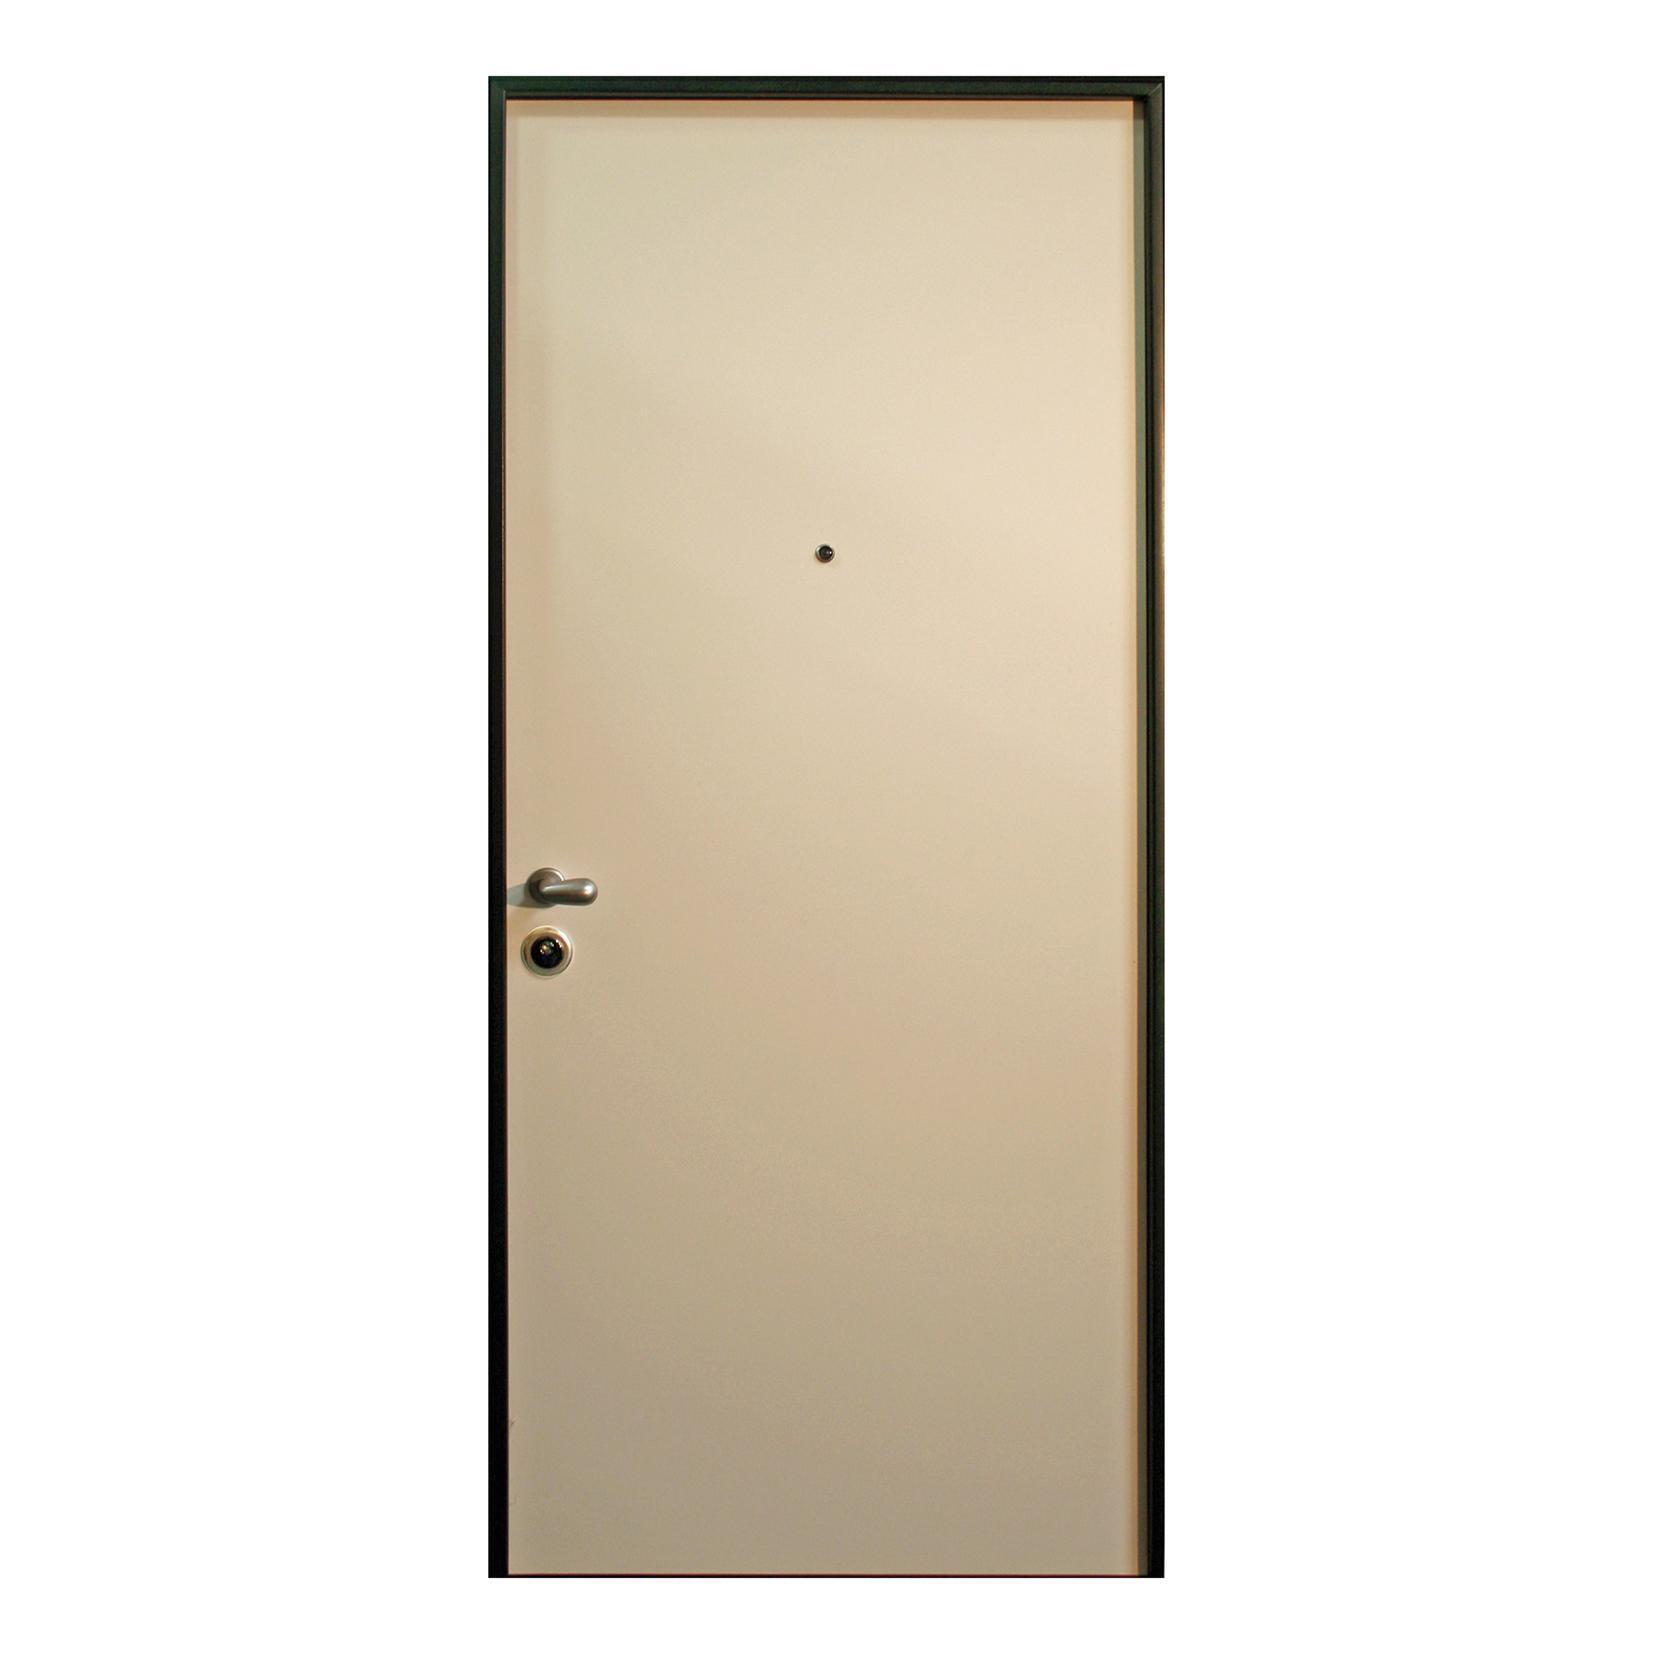 Porta blindata Confort bianco L 90 x H 210 cm destra - 5